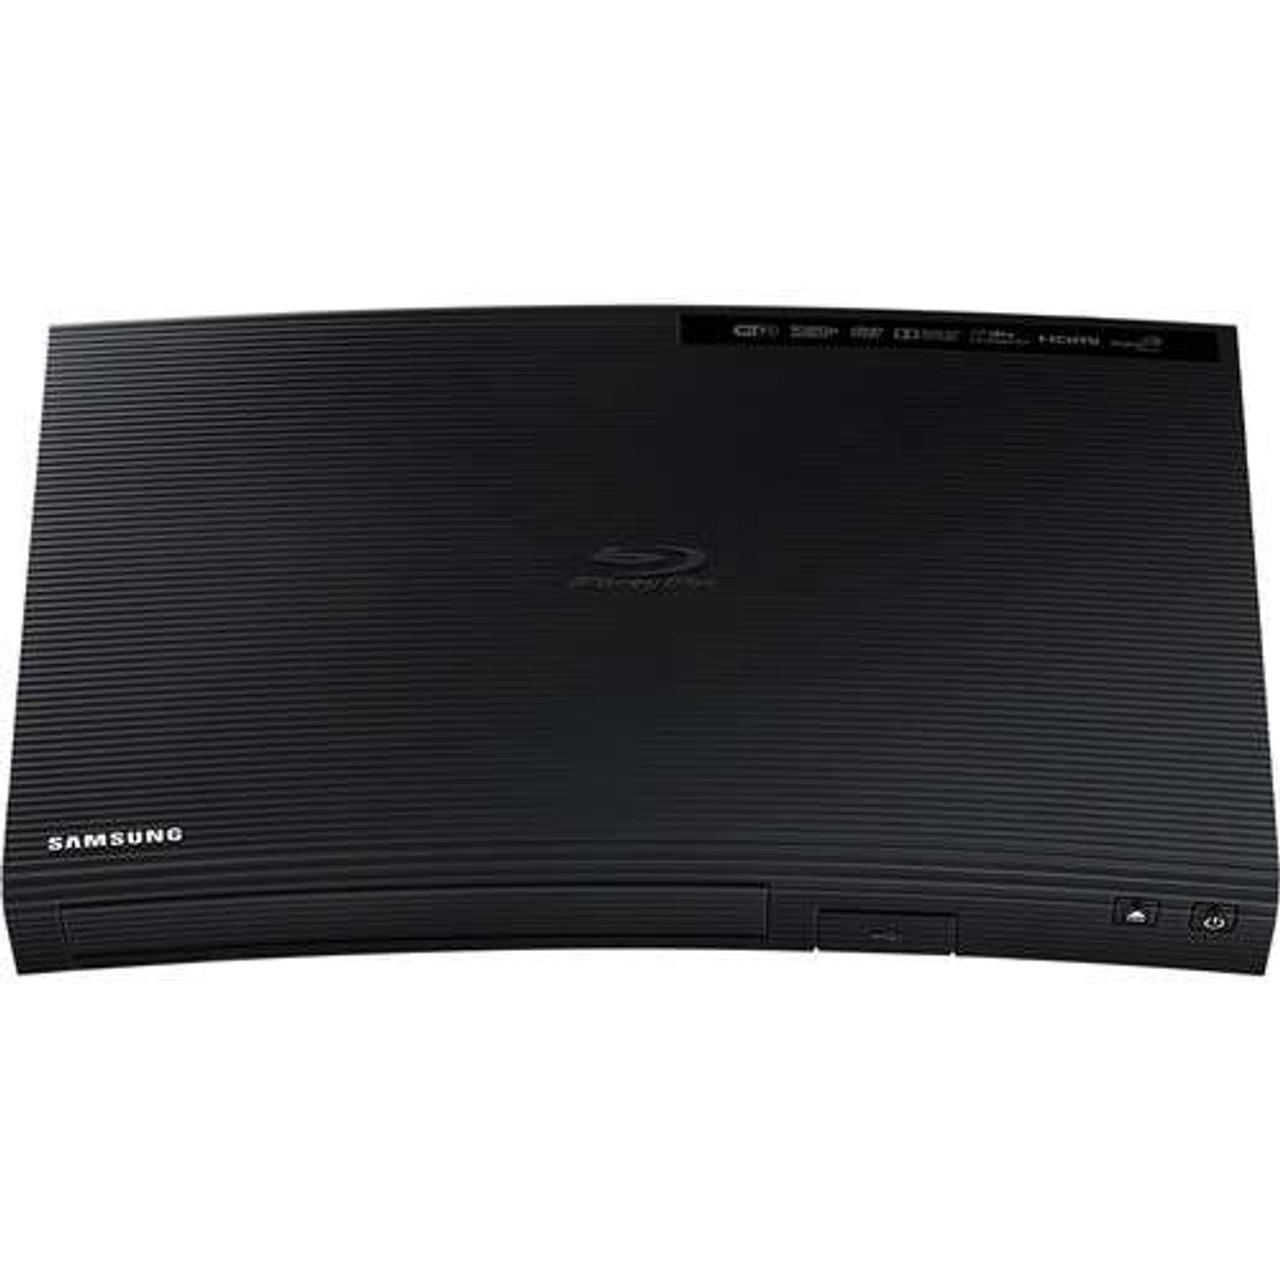 Samsung BD-J5700/ZAR 3D 4K Upscaling Blu-ray Player- Certified Refurbished